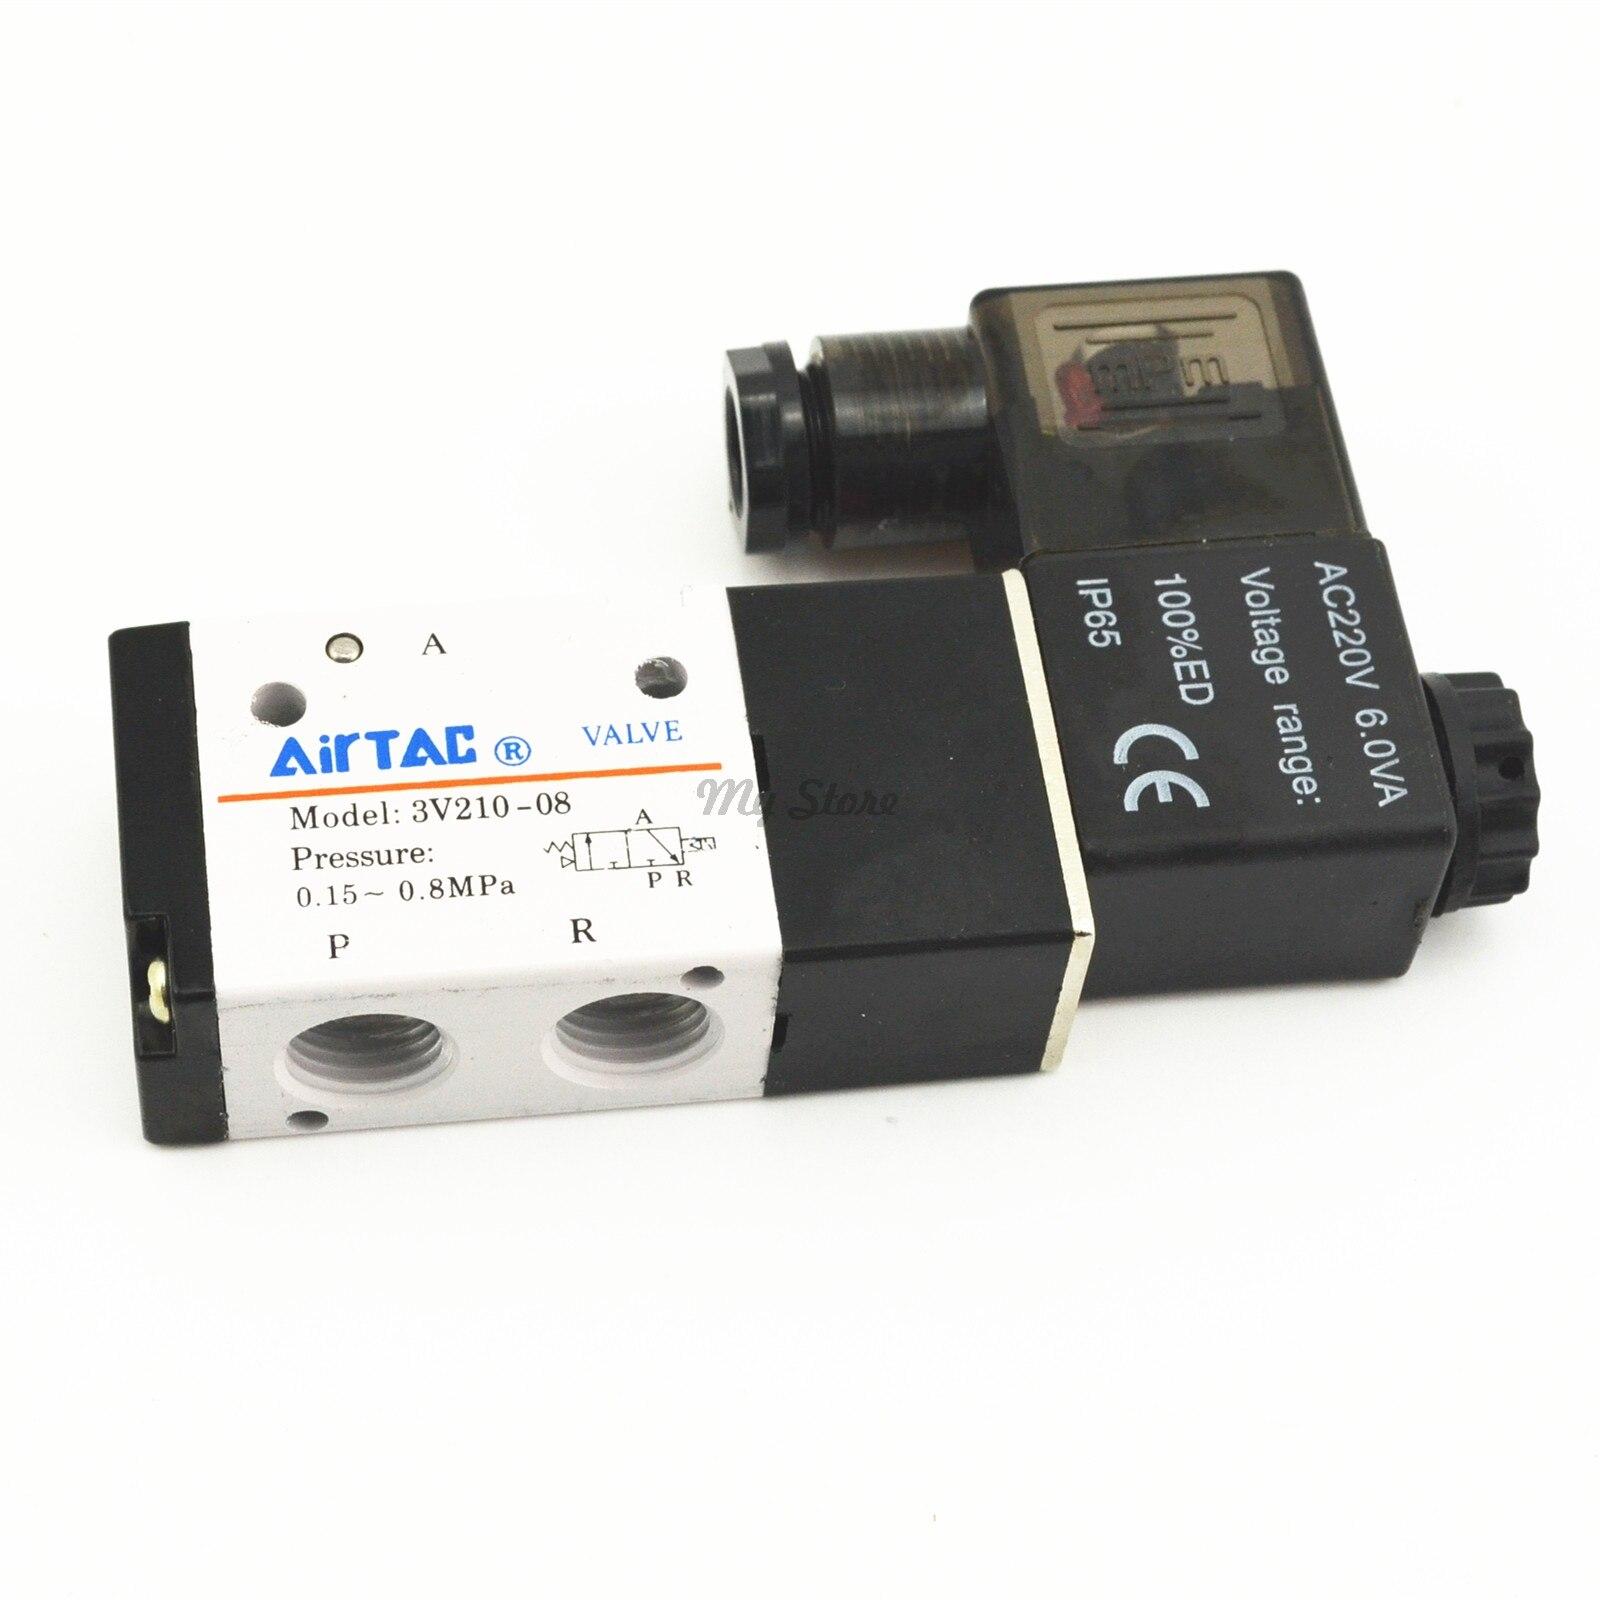 Pneumatic 3 Way 2 Position Air Directional Control Solenoid Valve 3V210-08 DC12V DC24V AC110V AC220V